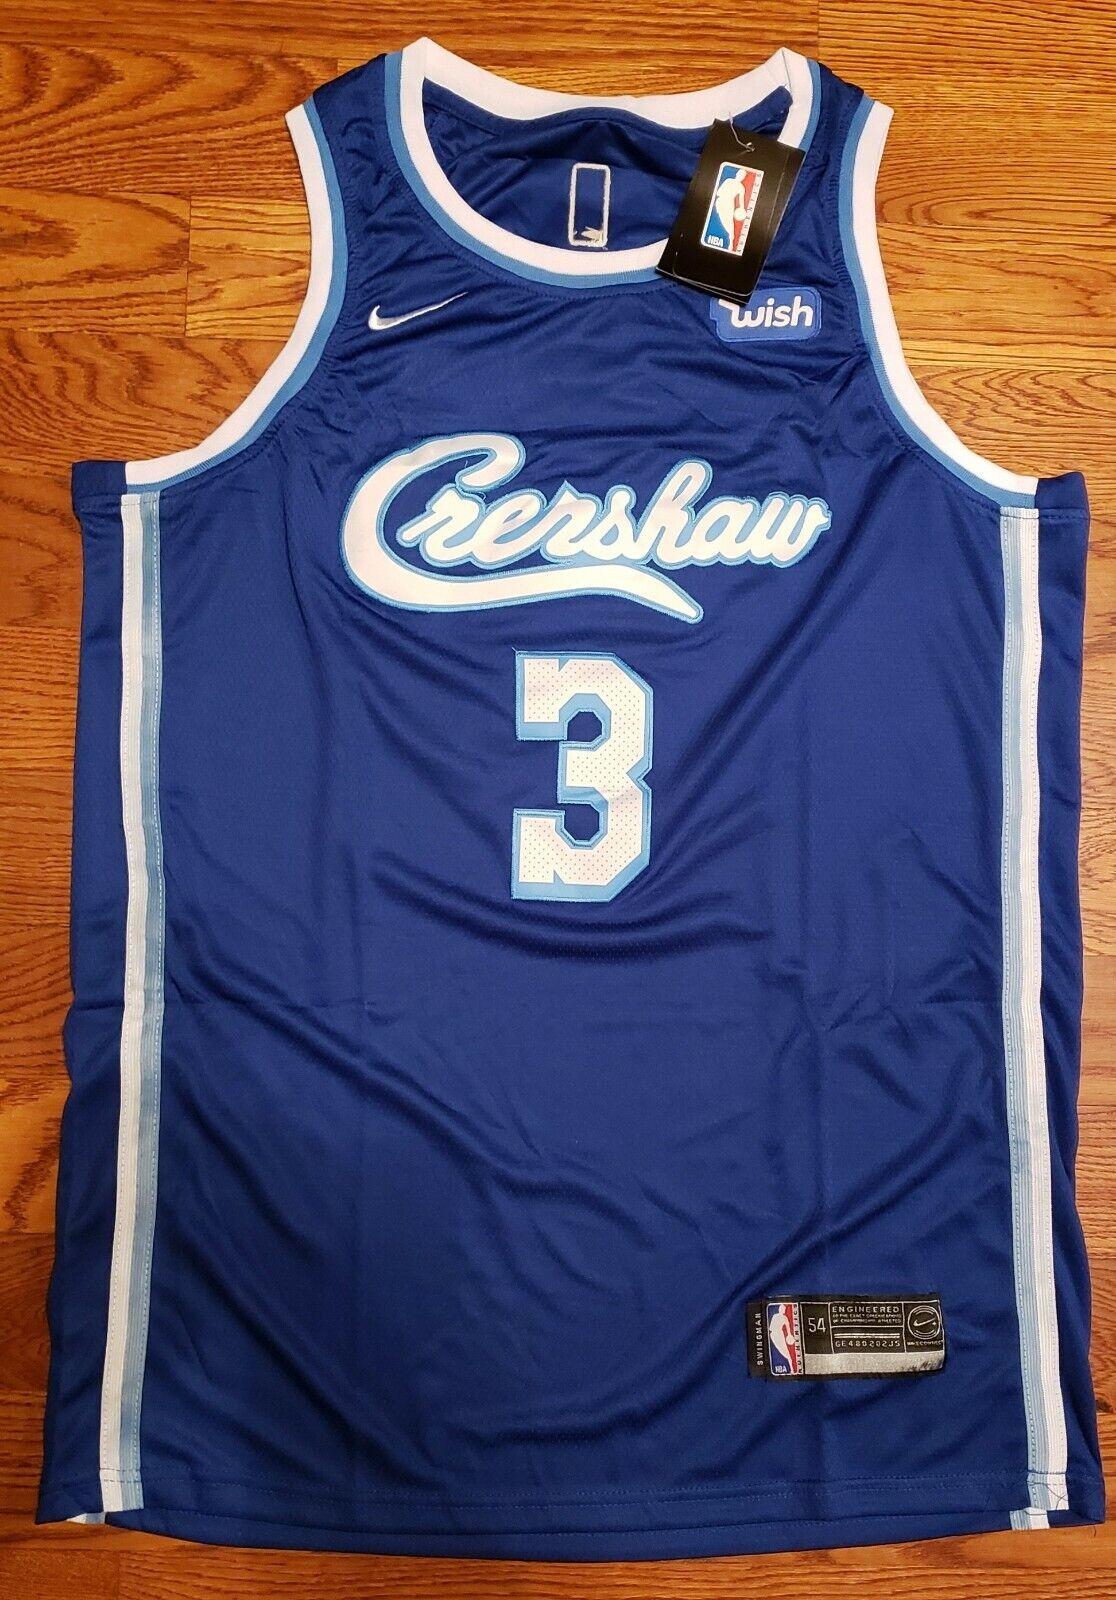 Lakers Crenshaw Anthony Davis #3 Jersey Adult XL NEW | eBay